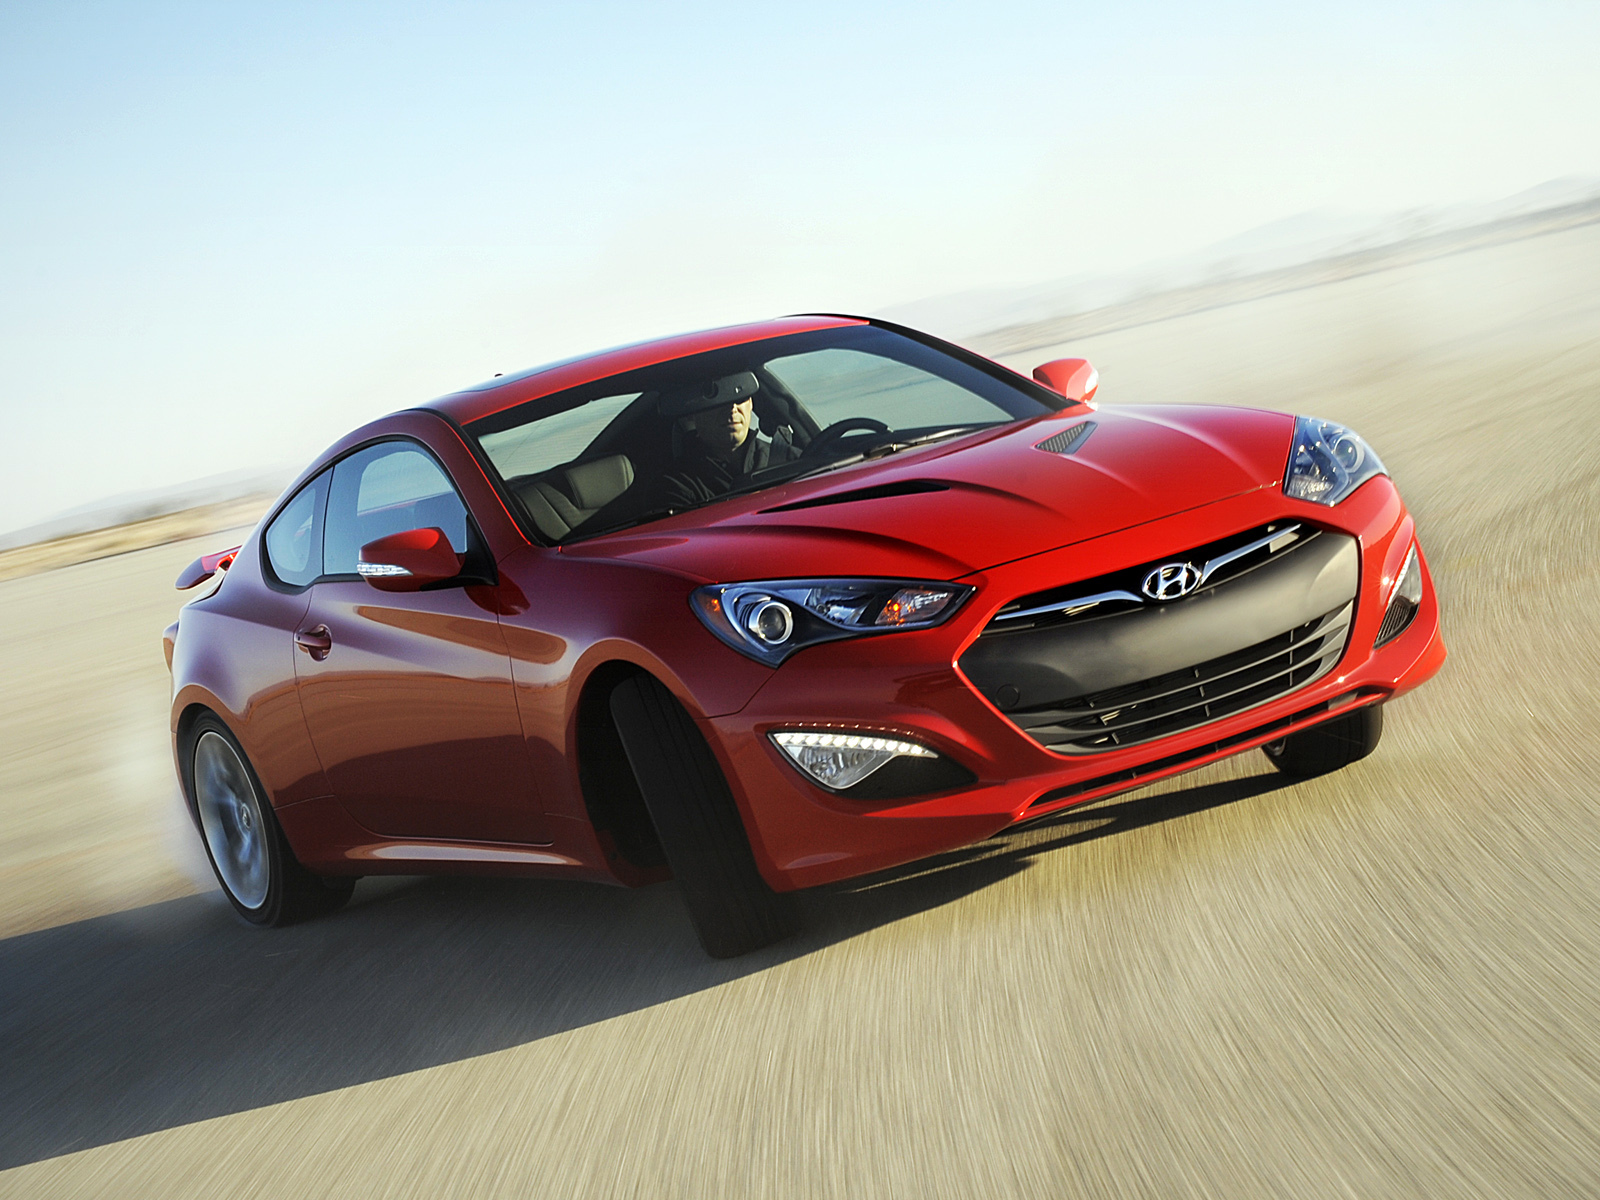 Hyundai Genesis Coupe HD Wallpaper